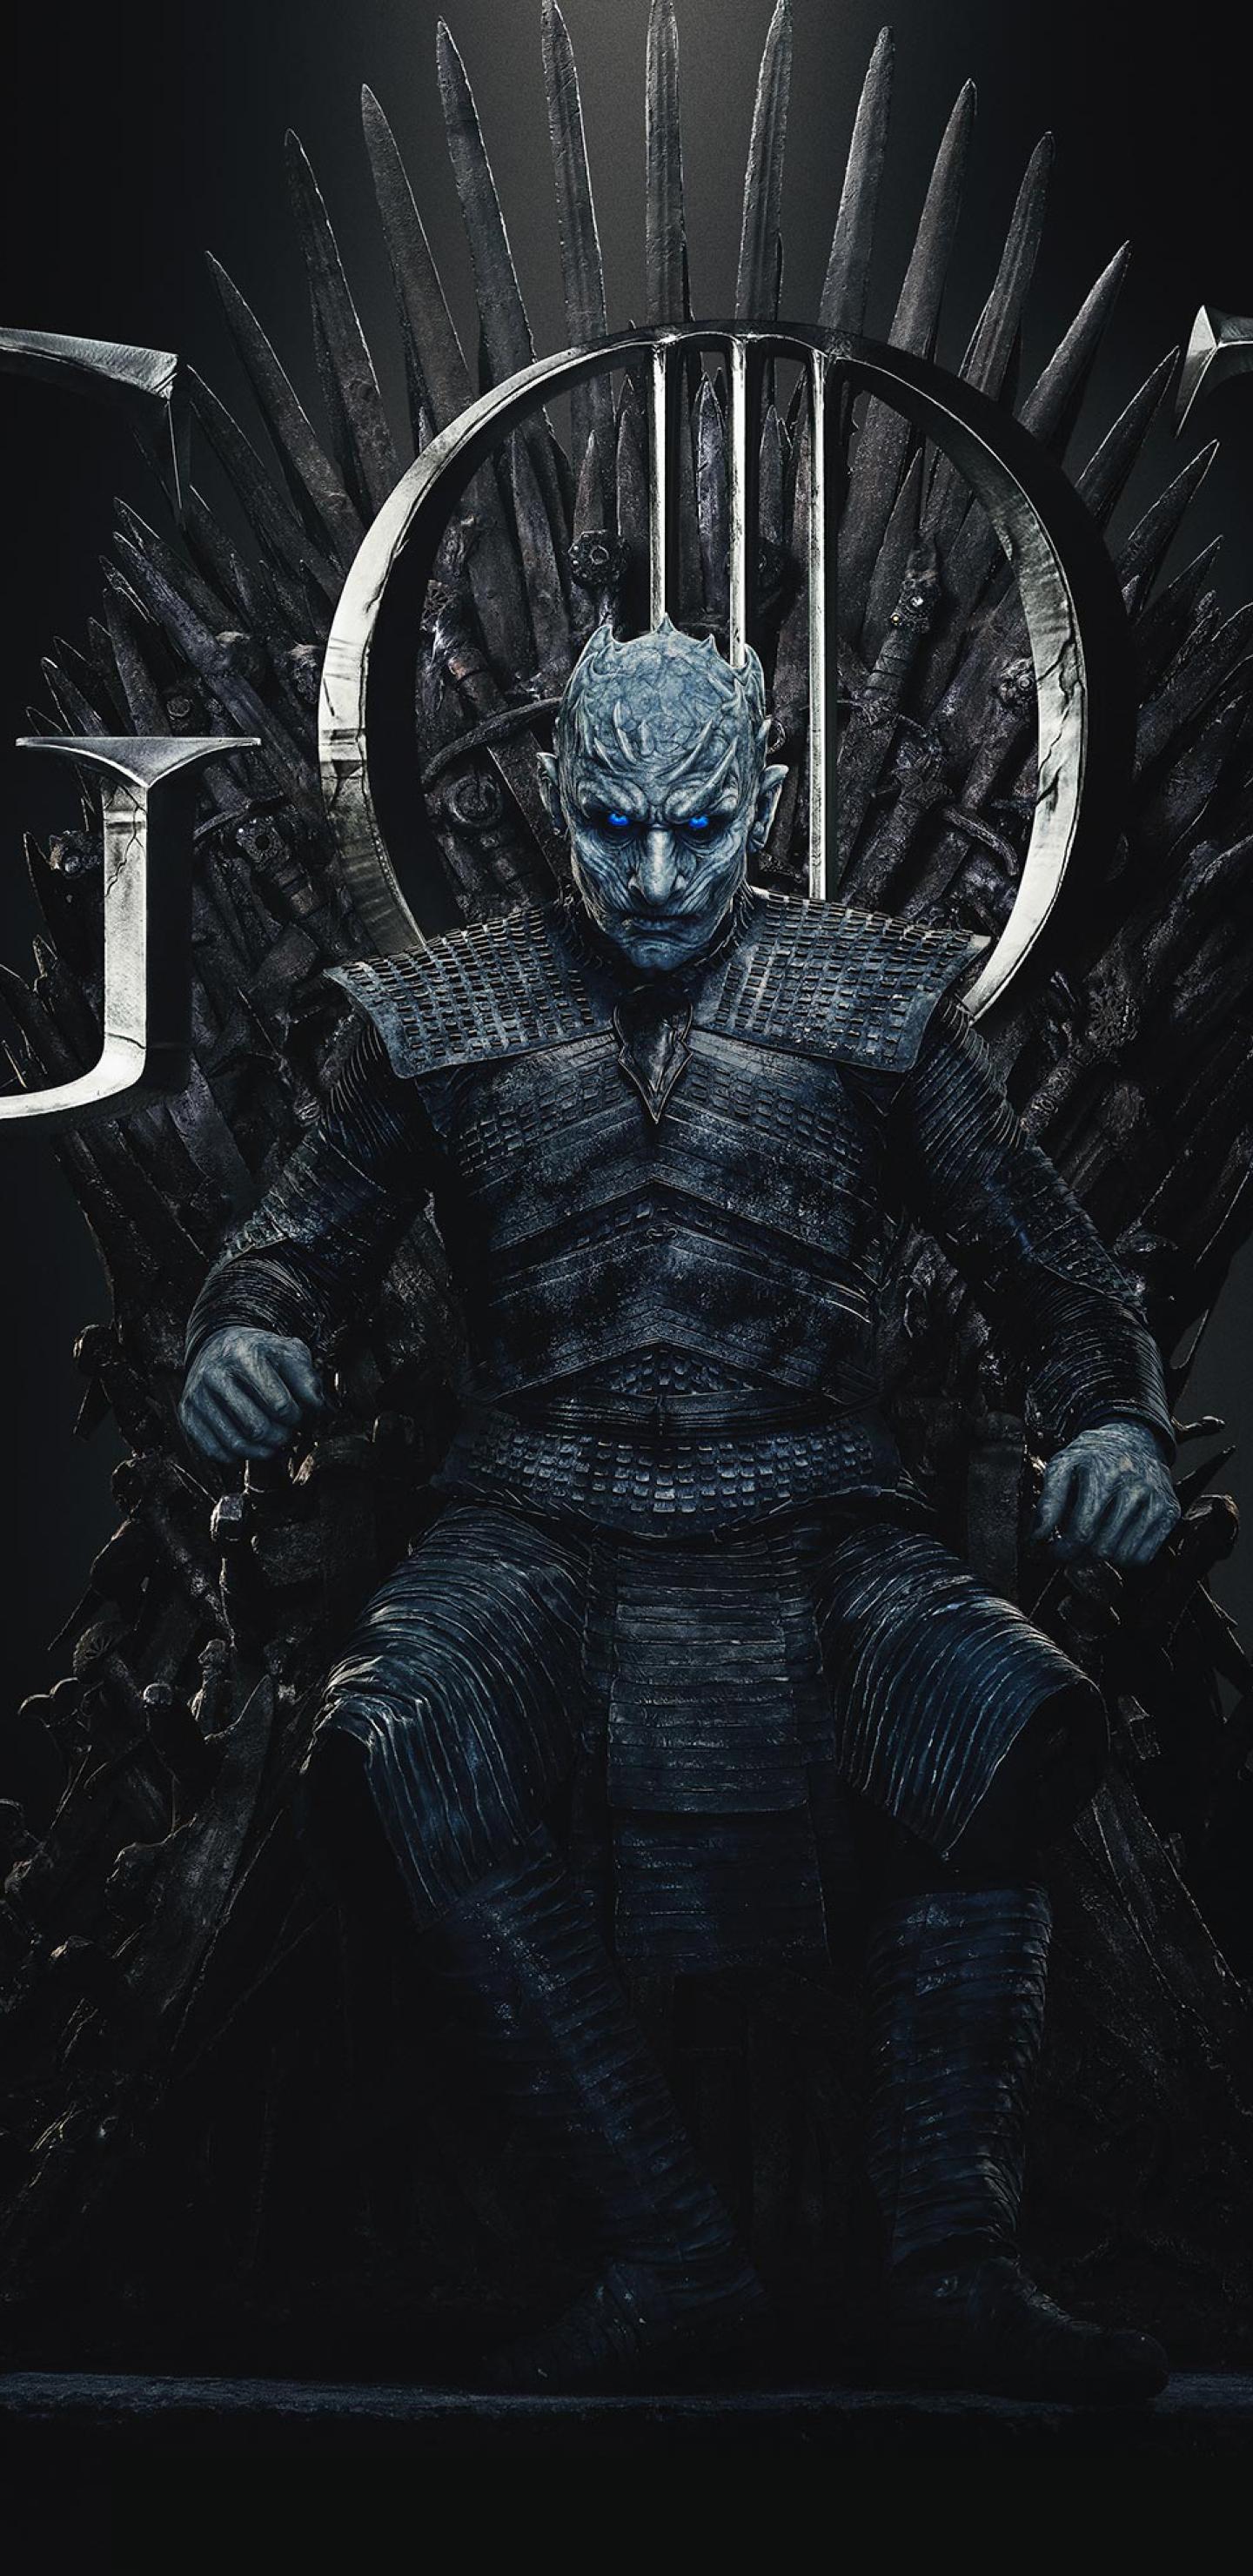 1440x2960 Night King Game Of Thrones Season 8 Poster Samsung